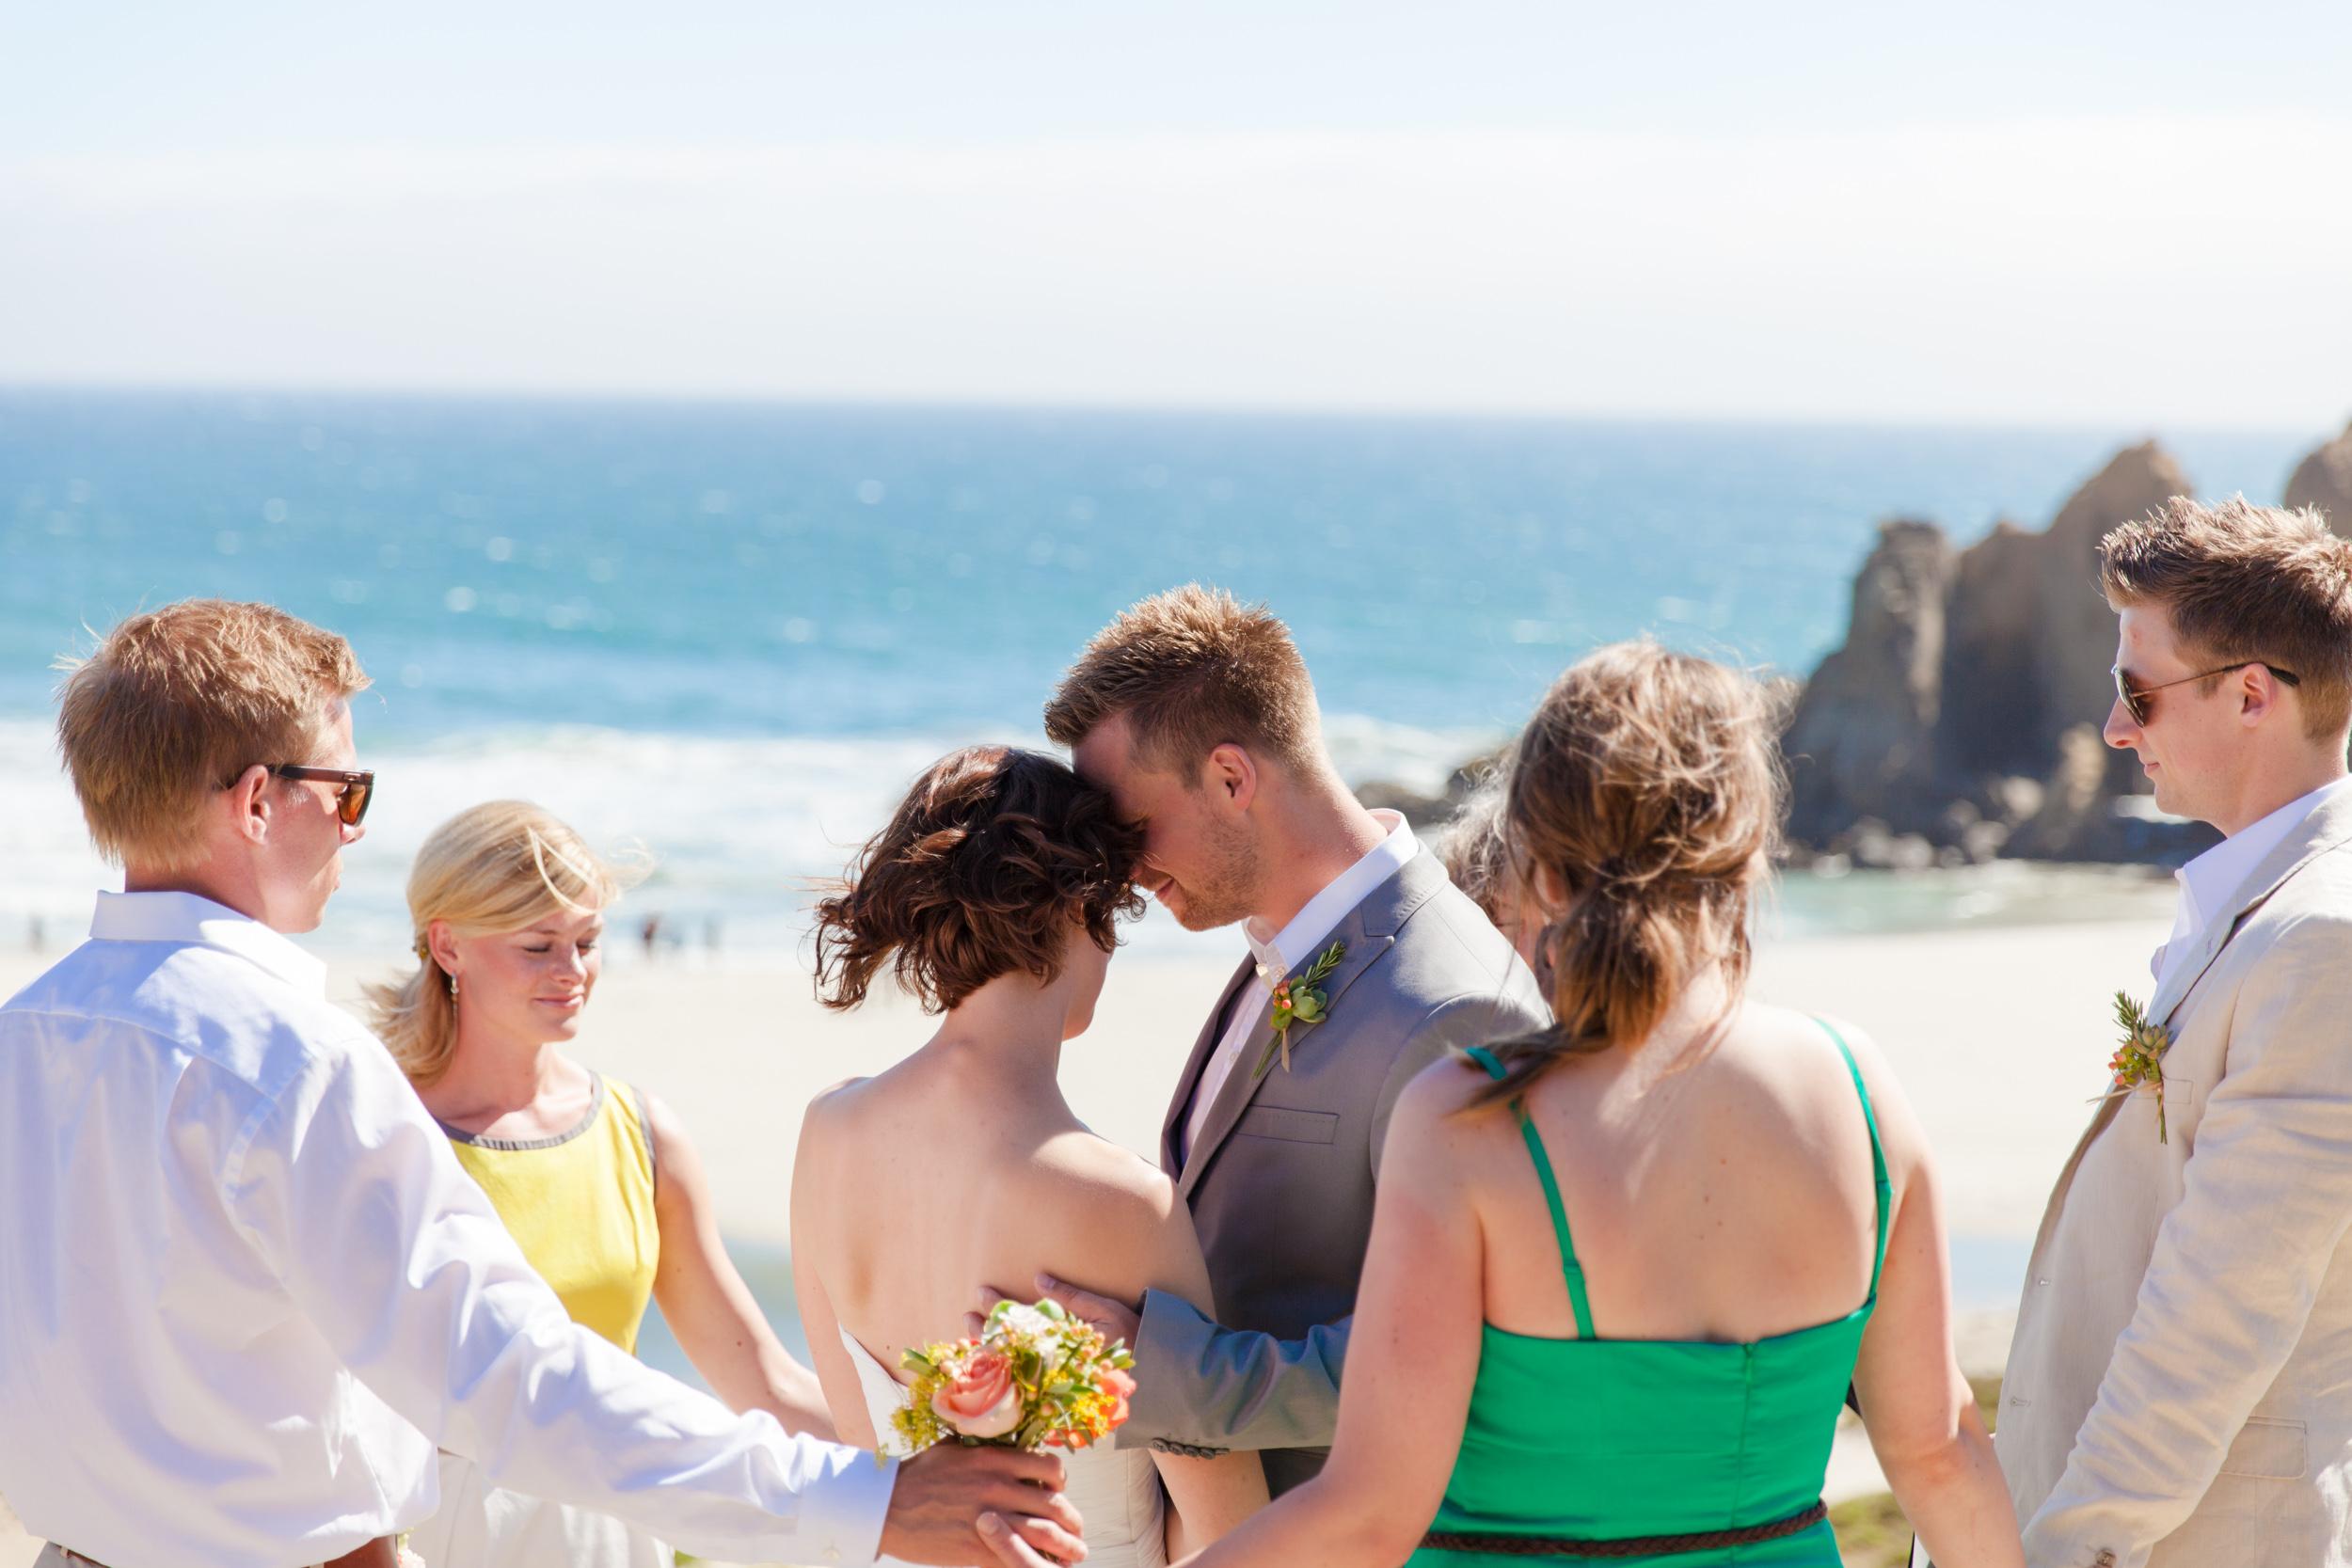 19--jewel-maree-photography-wedding.jpg